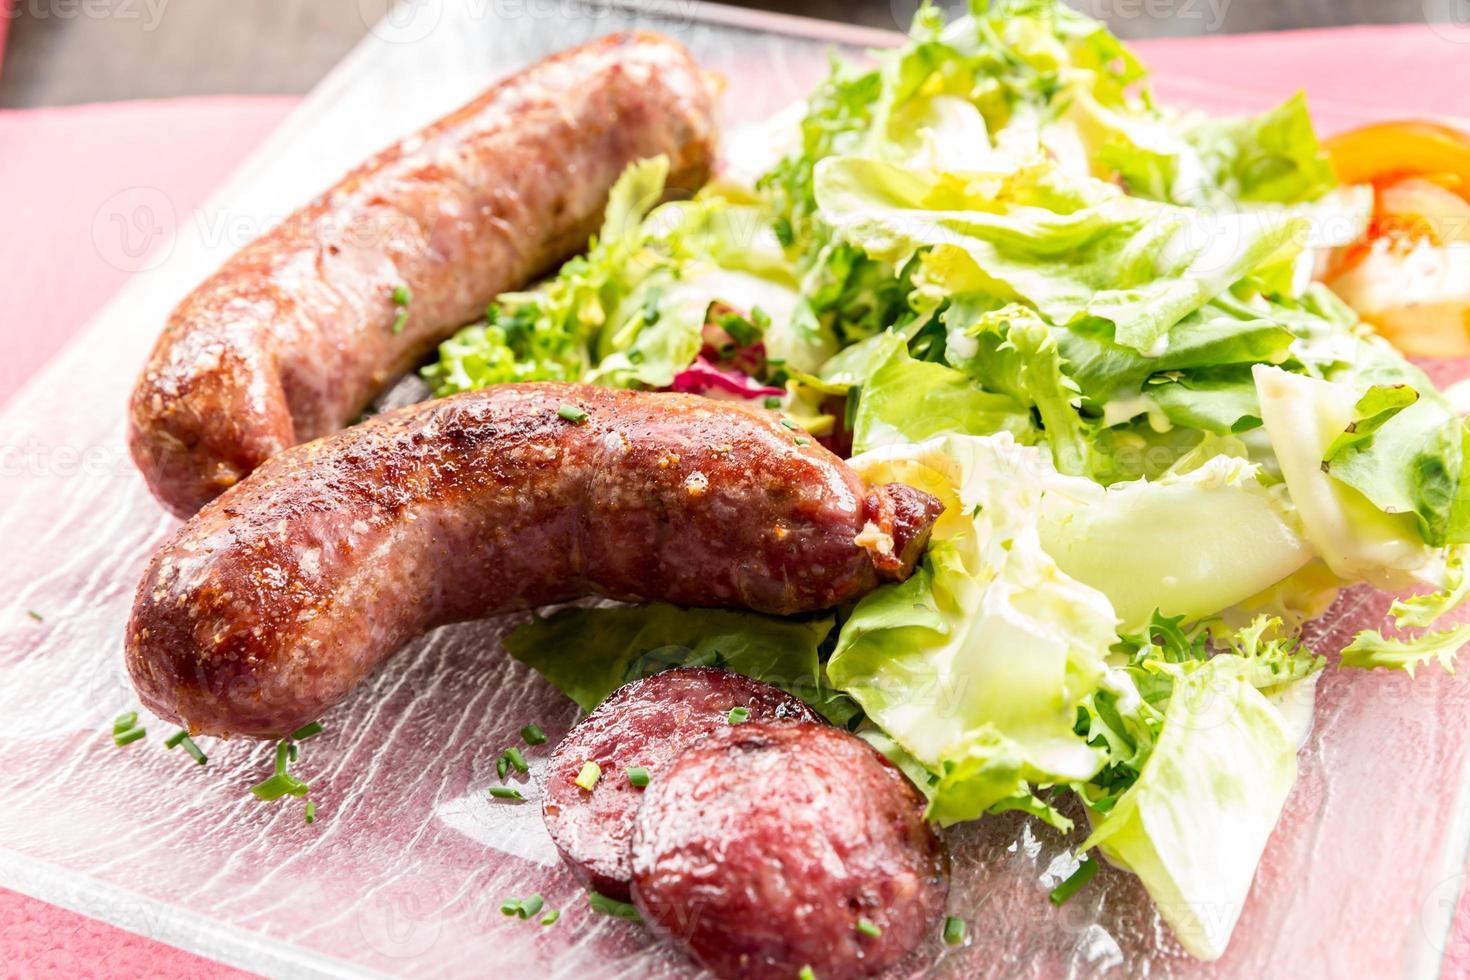 salsicce tedesche alla griglia foto